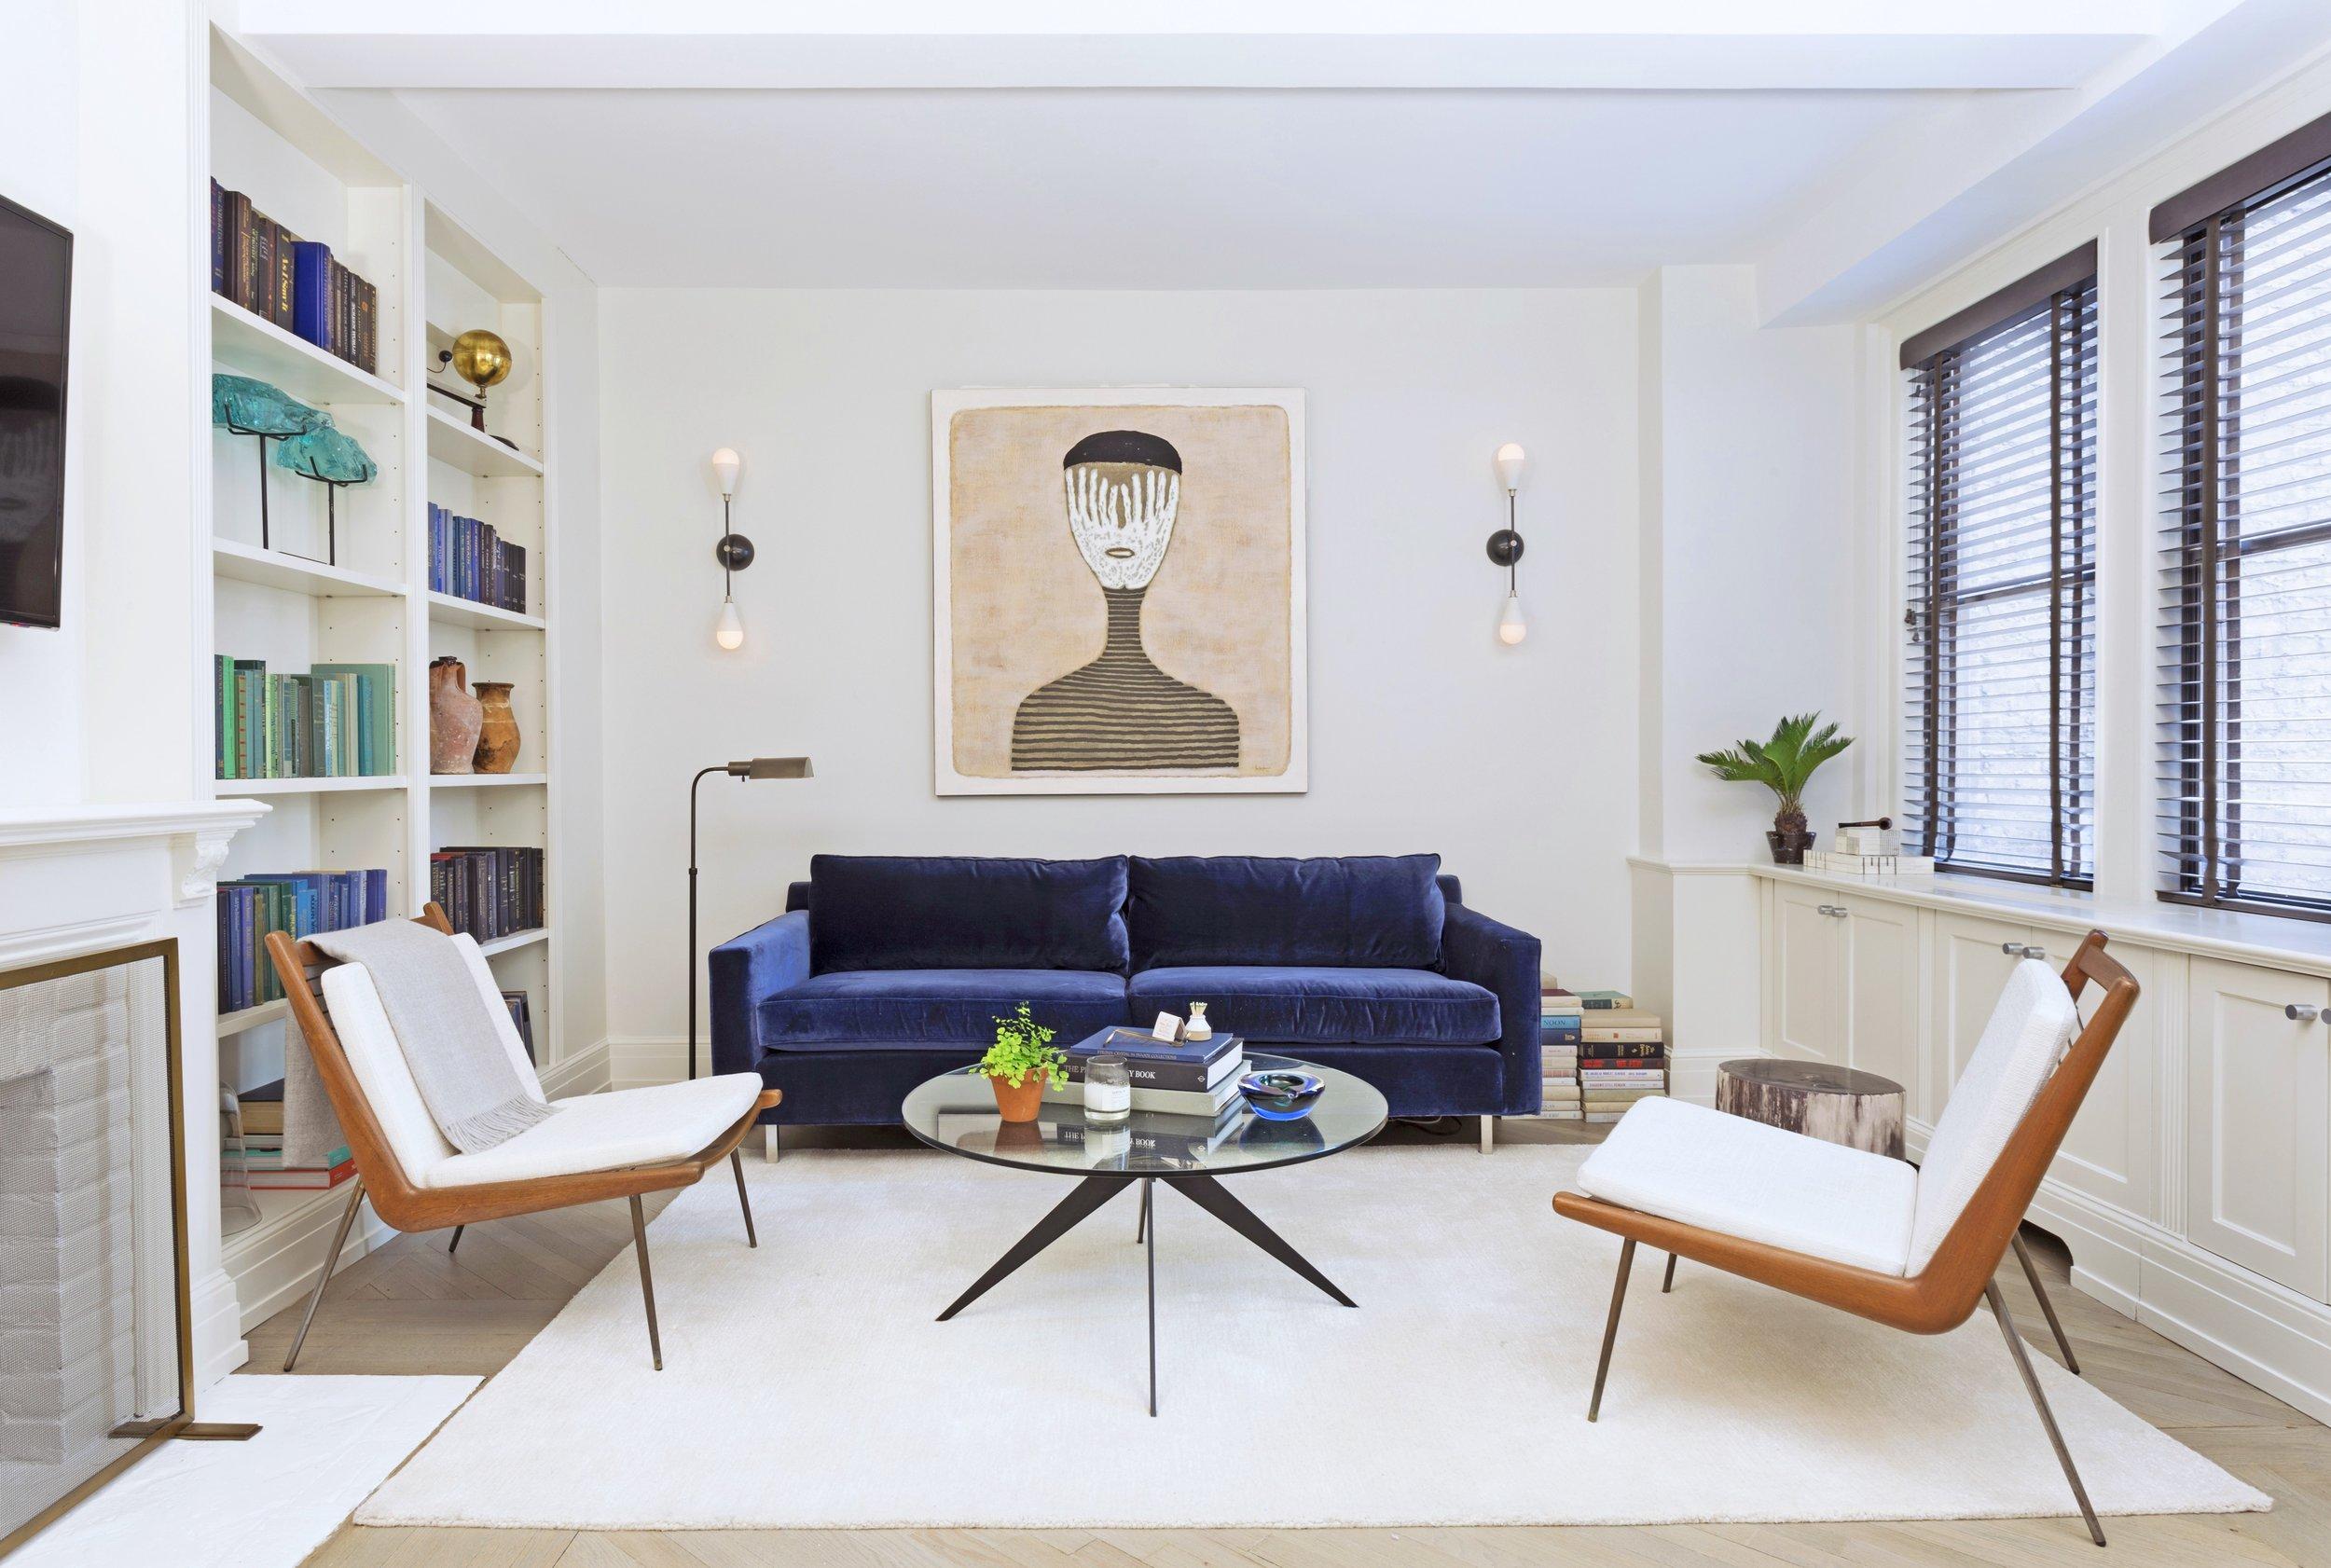 ashley-darryl-new-york-apartment-001.jpg